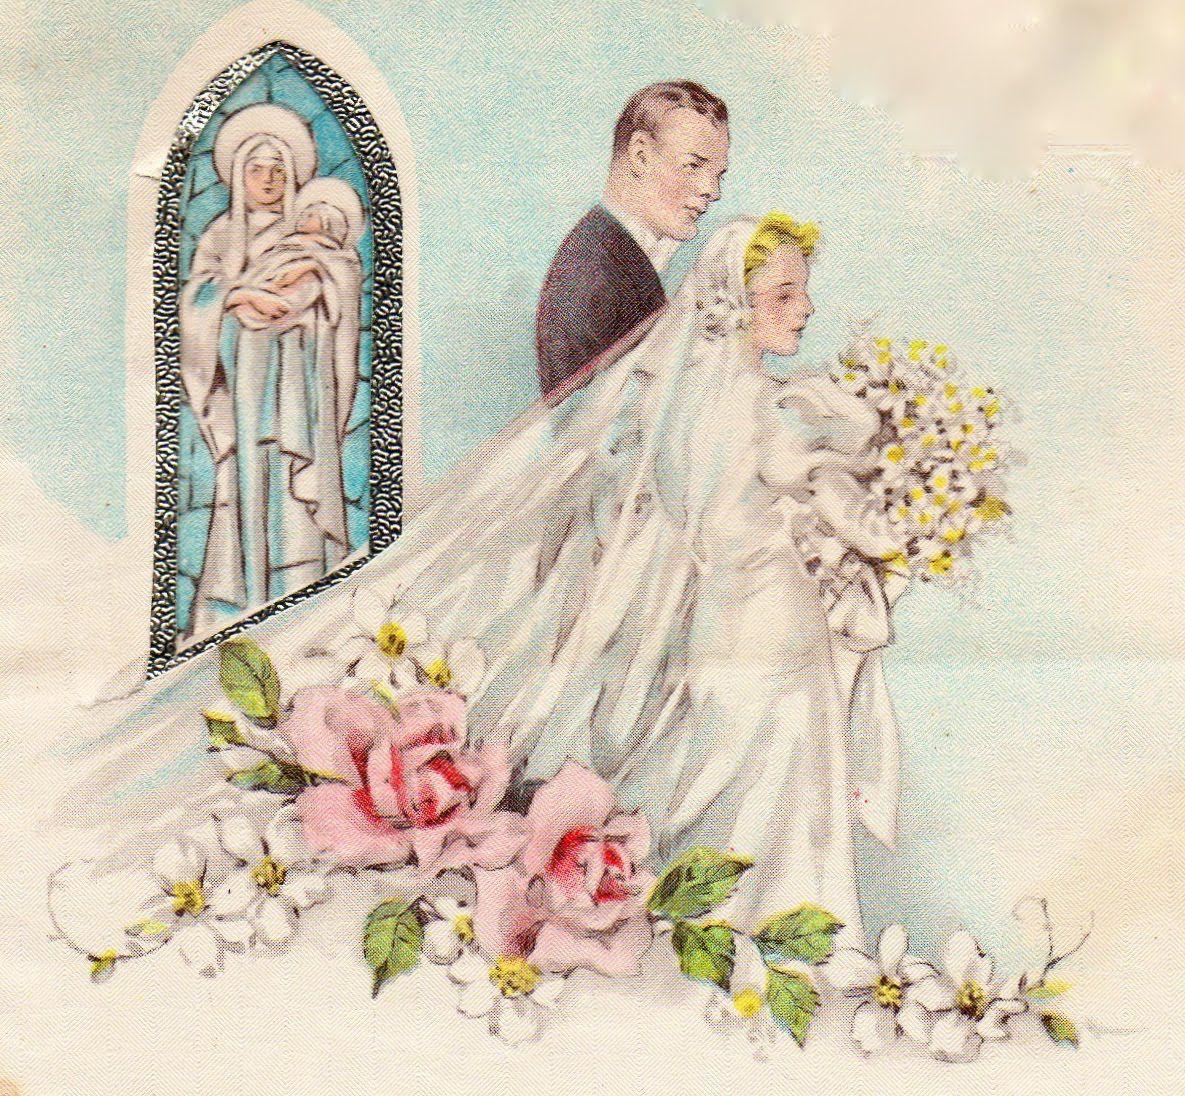 Месяцами внуку, открытка с днем свадьбы винтажная